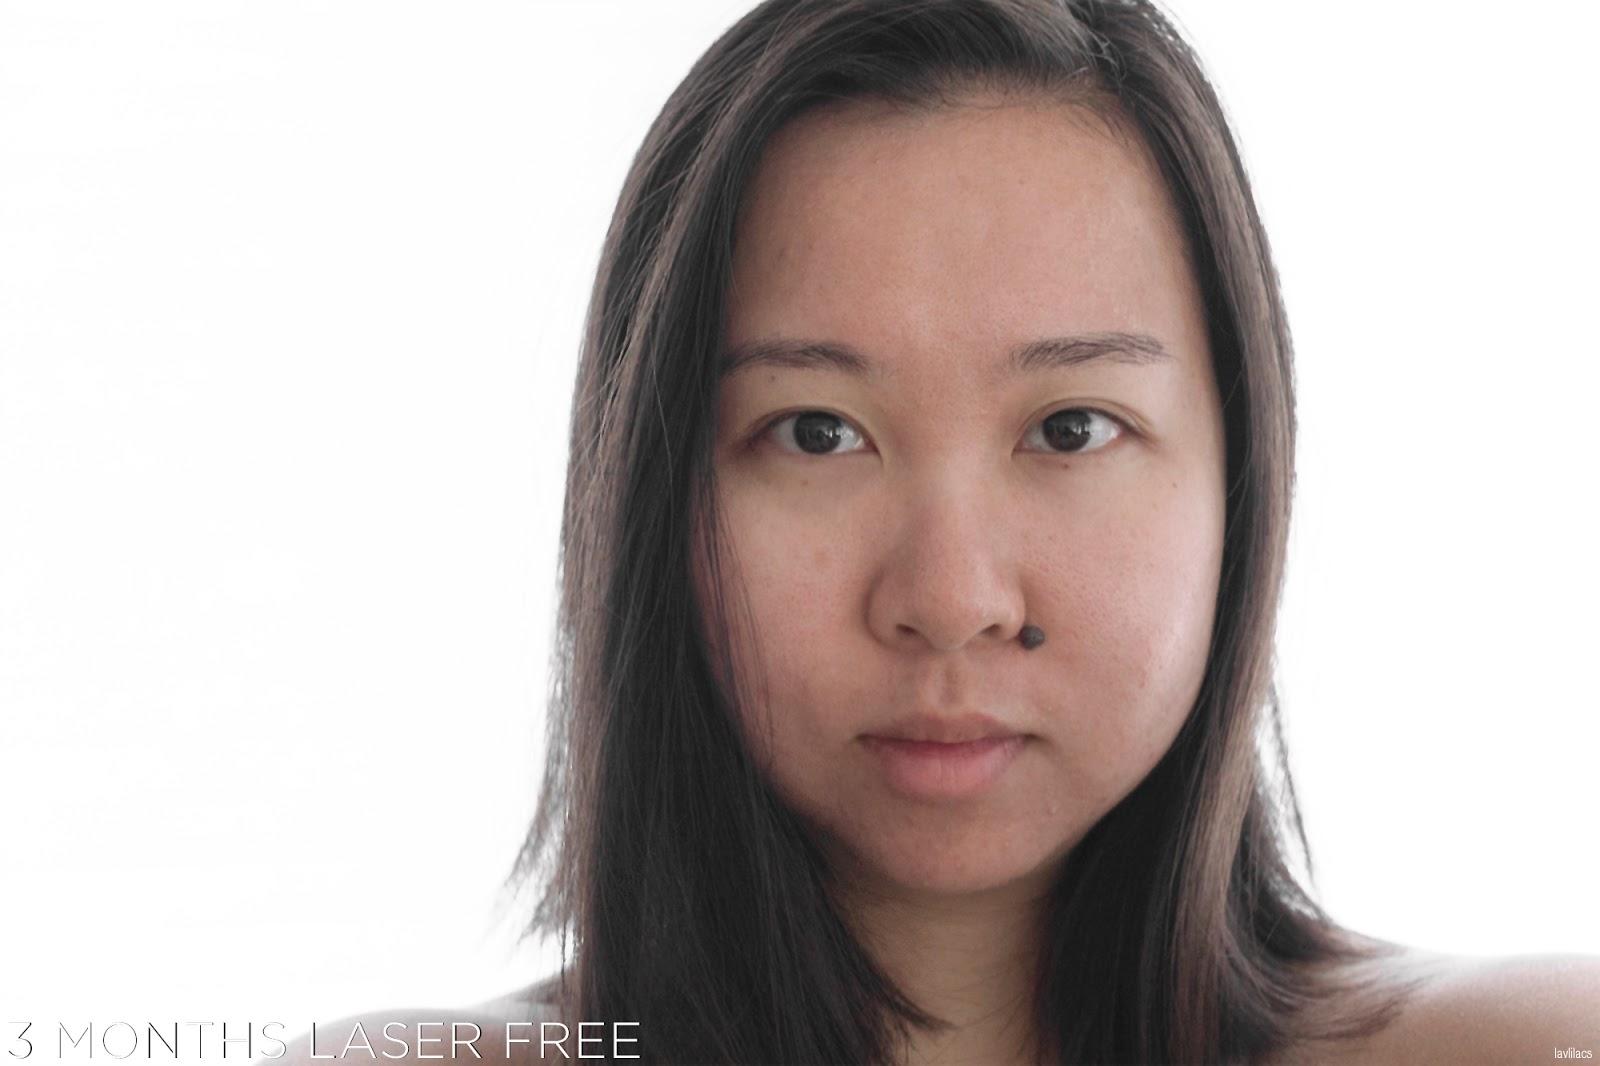 tria Hair Removal Laser Facial Hair 3 Months Laser Free